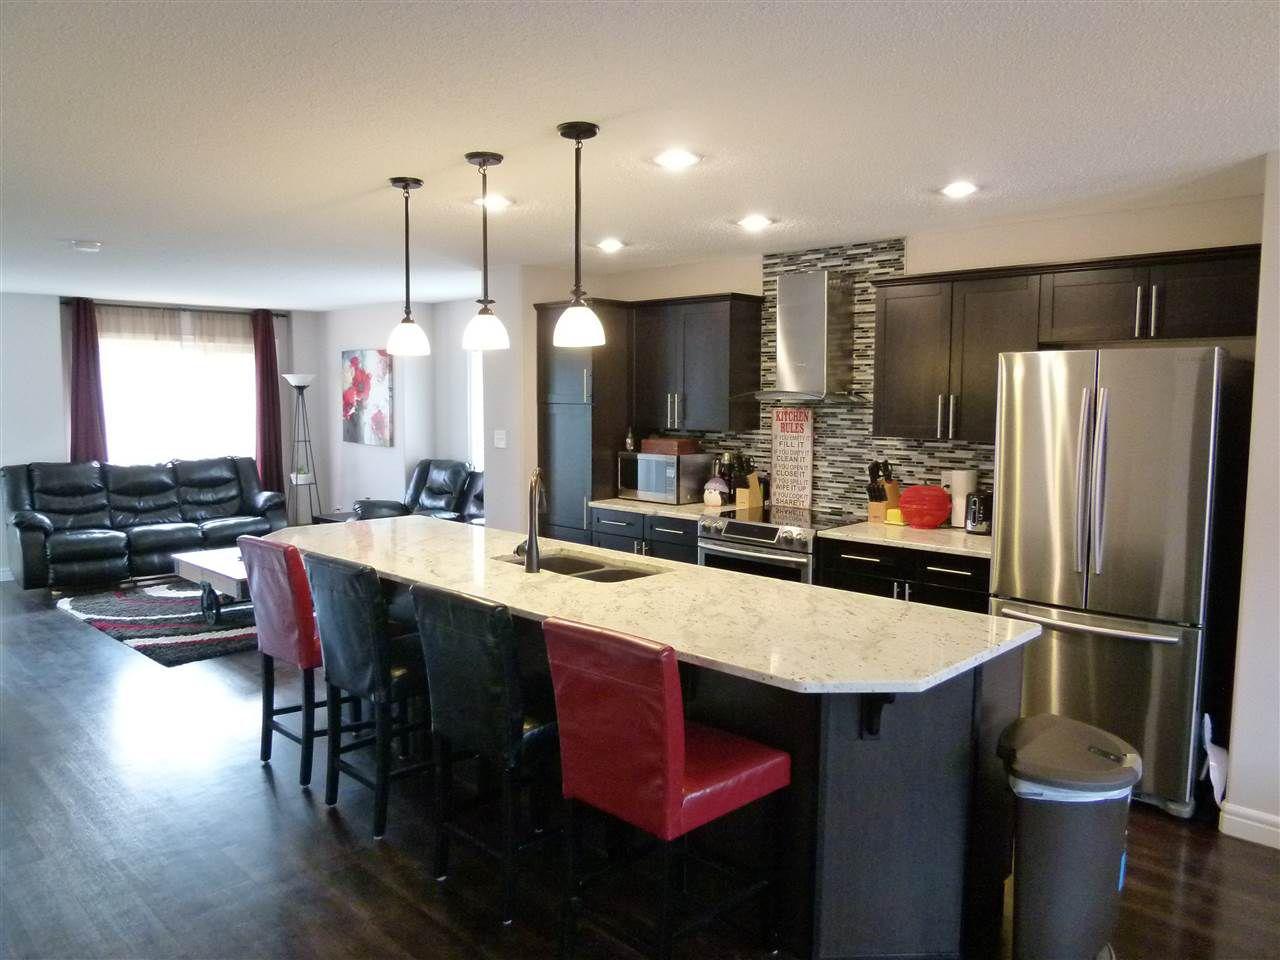 Main Photo: 3080 KESWICK Way in Edmonton: Zone 56 Attached Home for sale : MLS®# E4142415